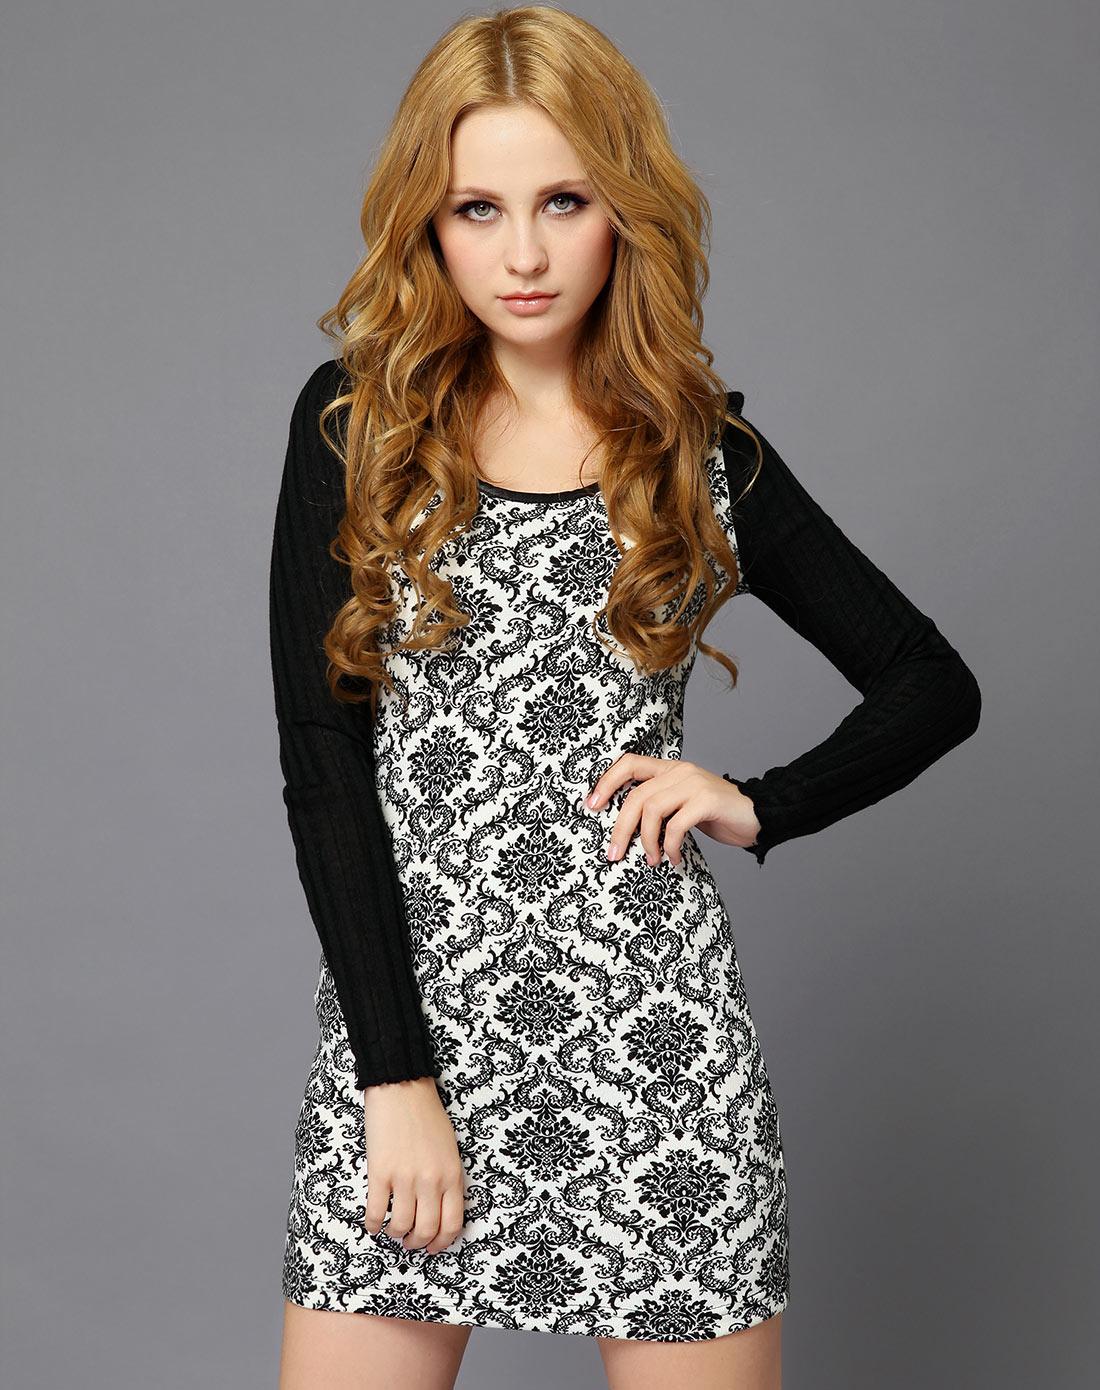 arango黑白色欧式花纹针织衫2g38y346480